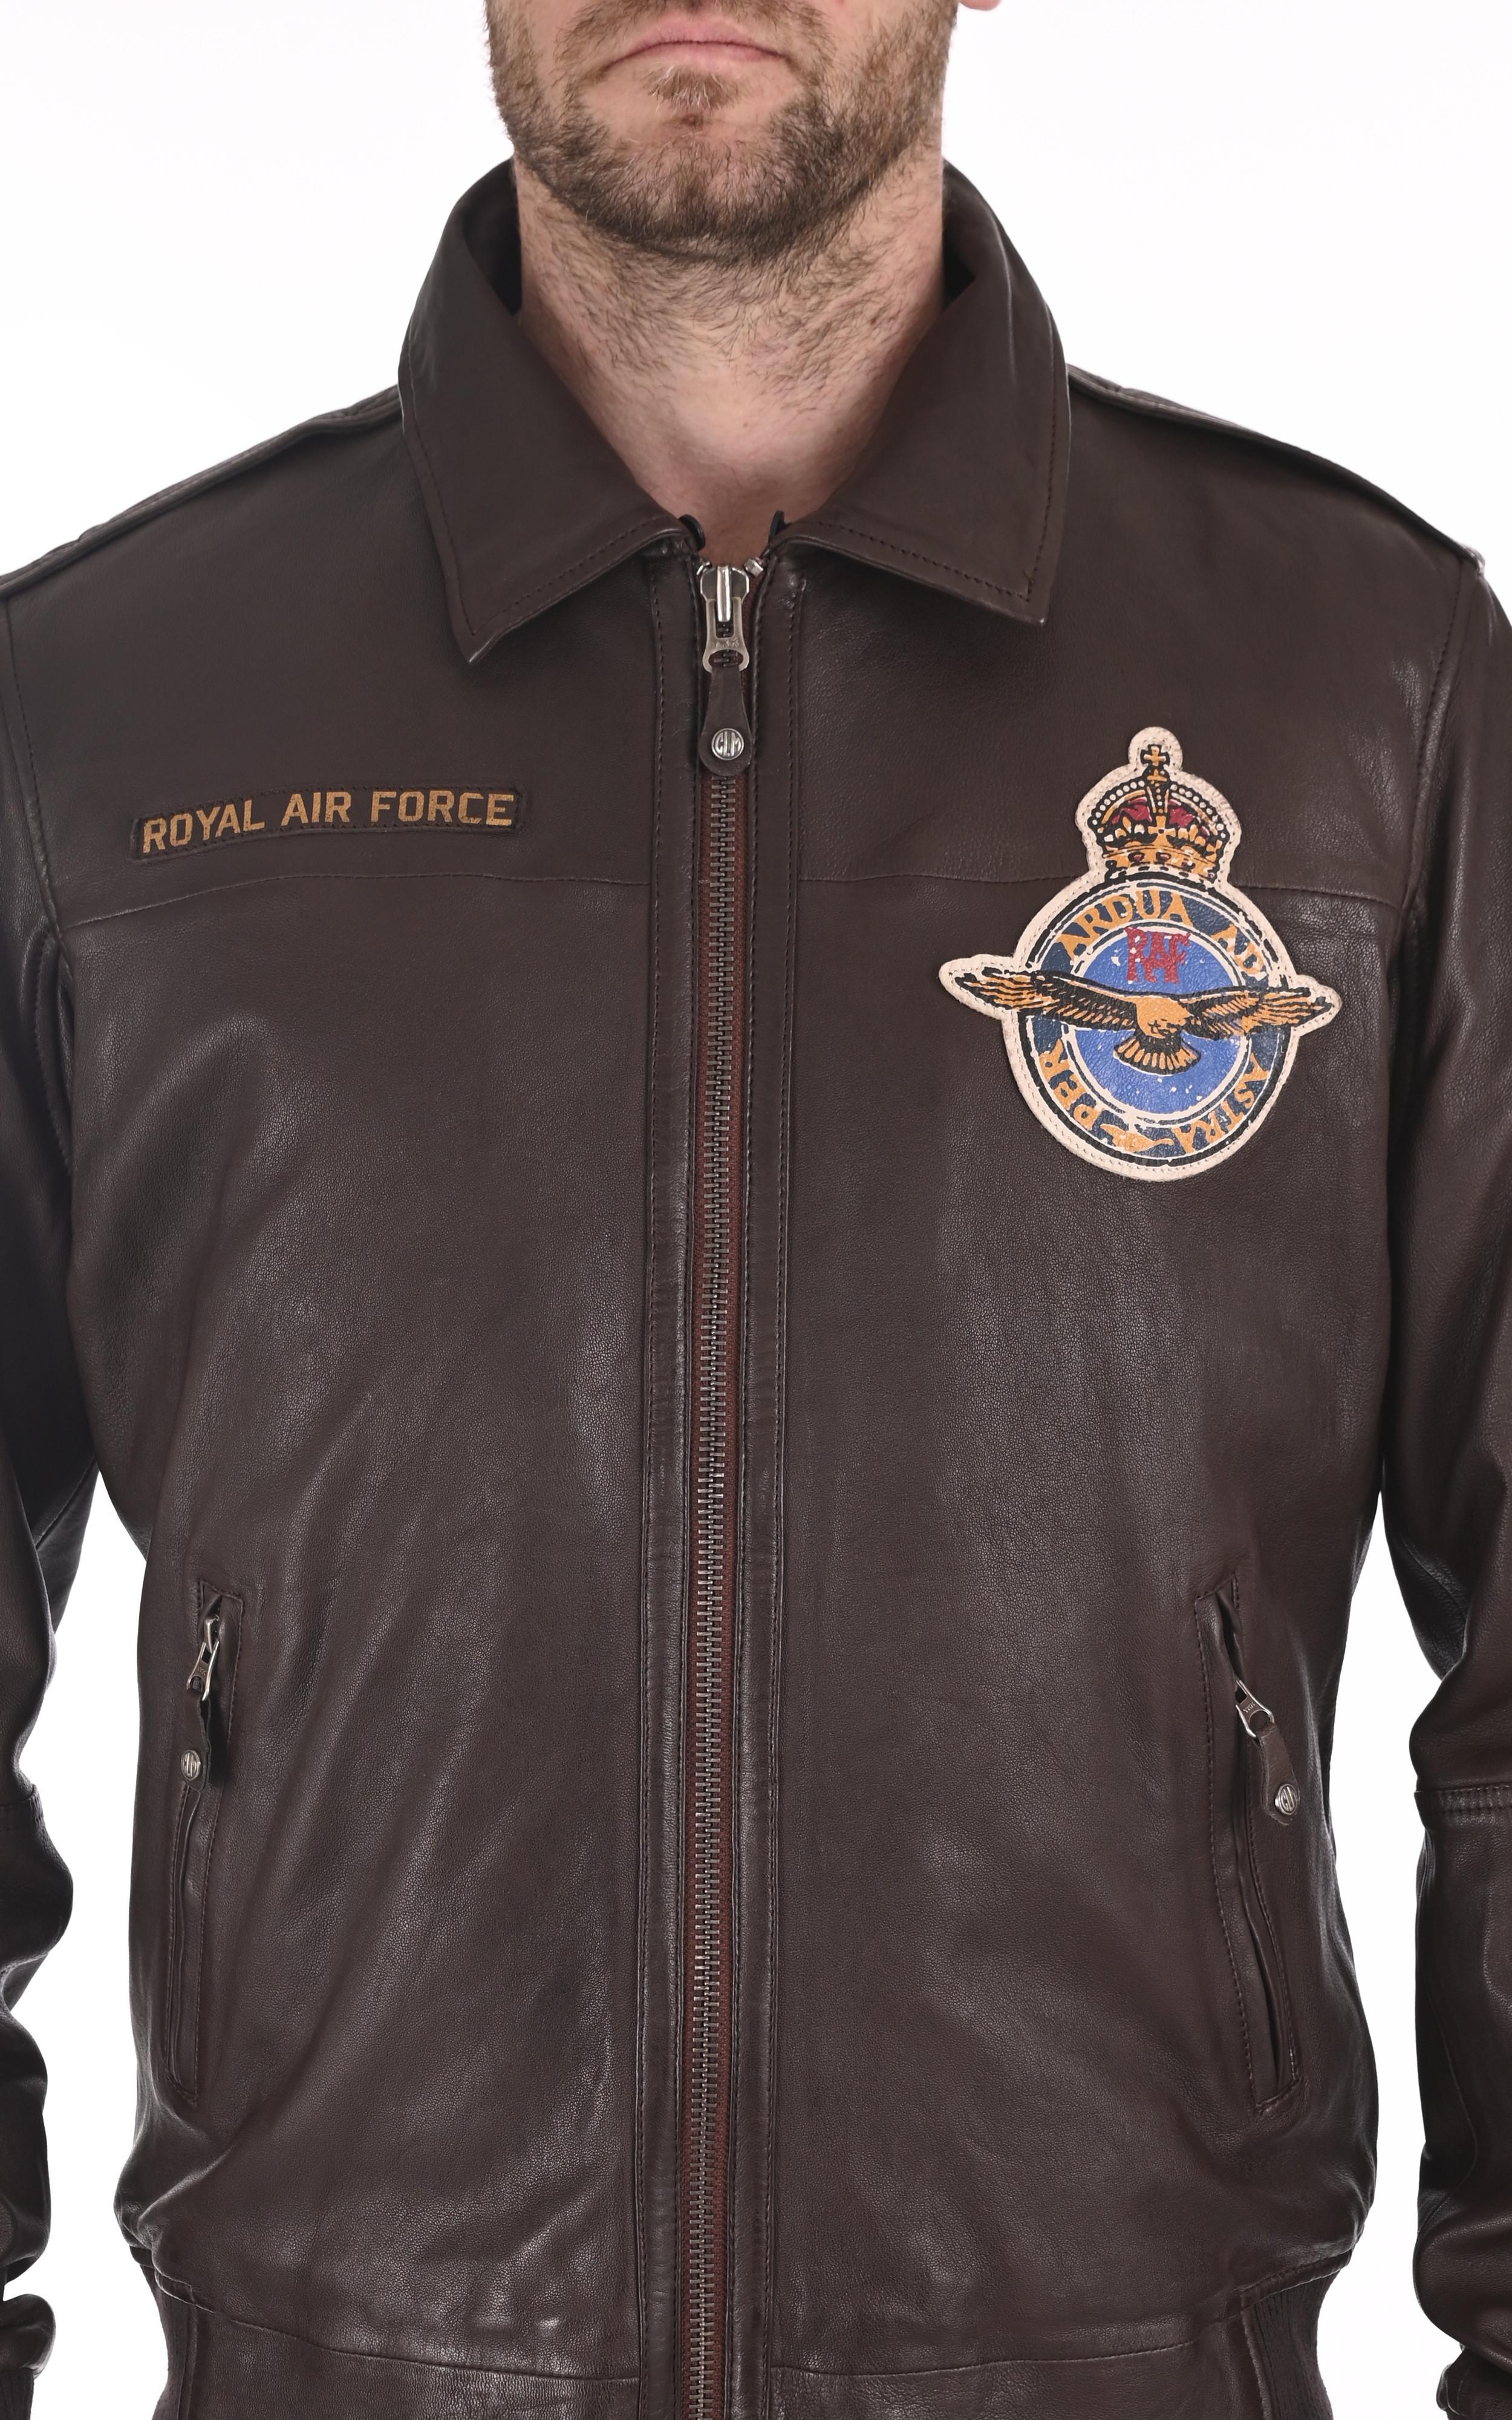 Pilote Douglas marron Royal Air Force